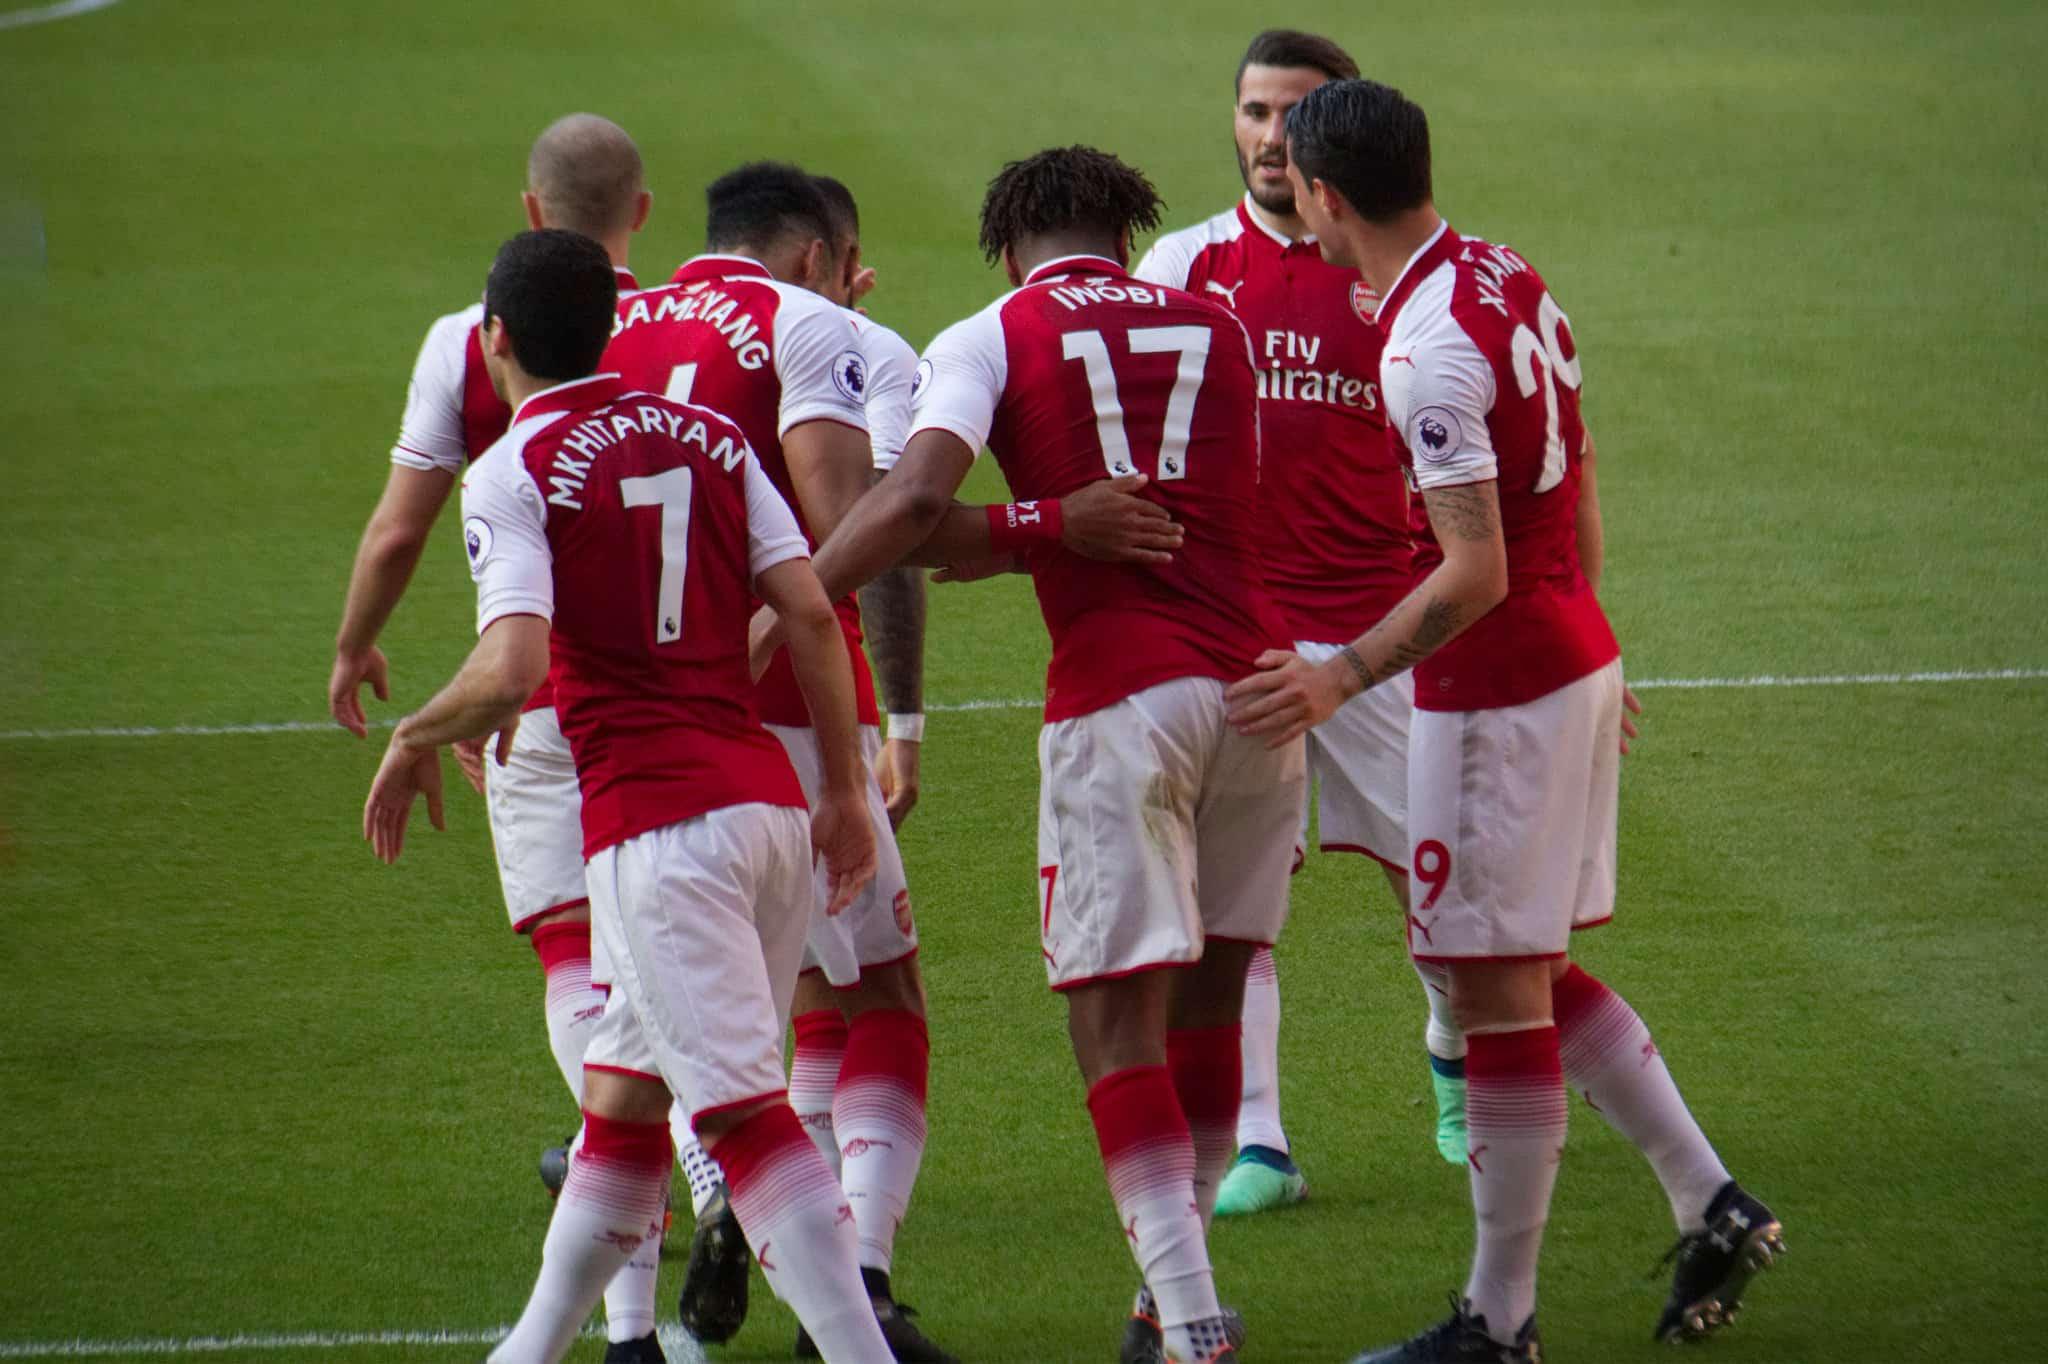 Highlights e gol Arsenal-Olympiakos 1-2 dts, Europa League 2019 ...